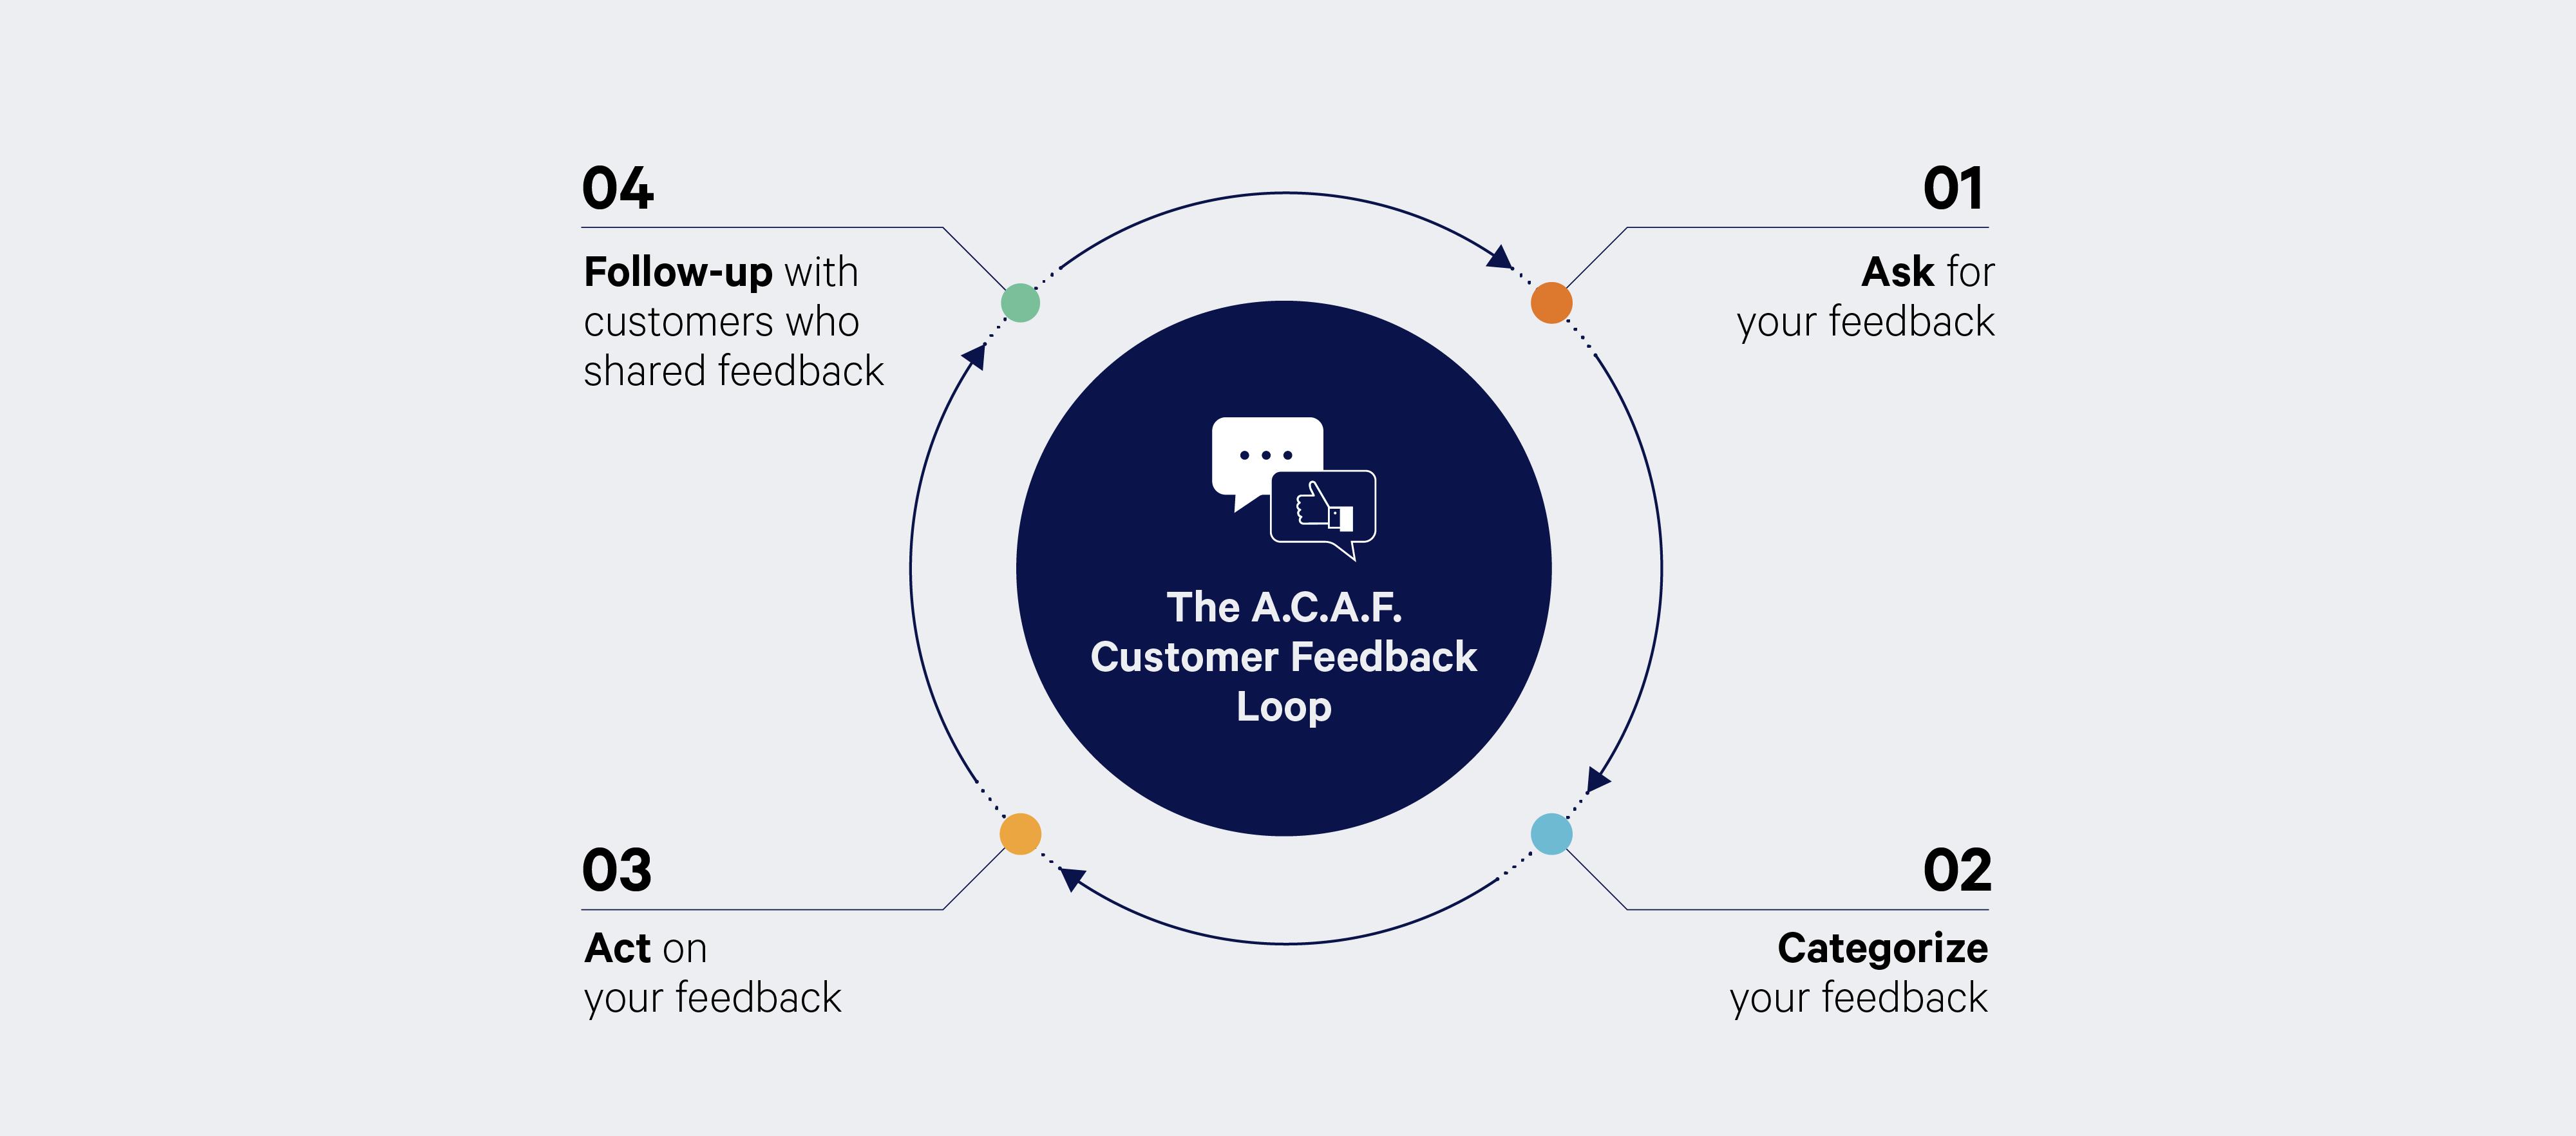 https://www.hubspot.com/customer-feedback